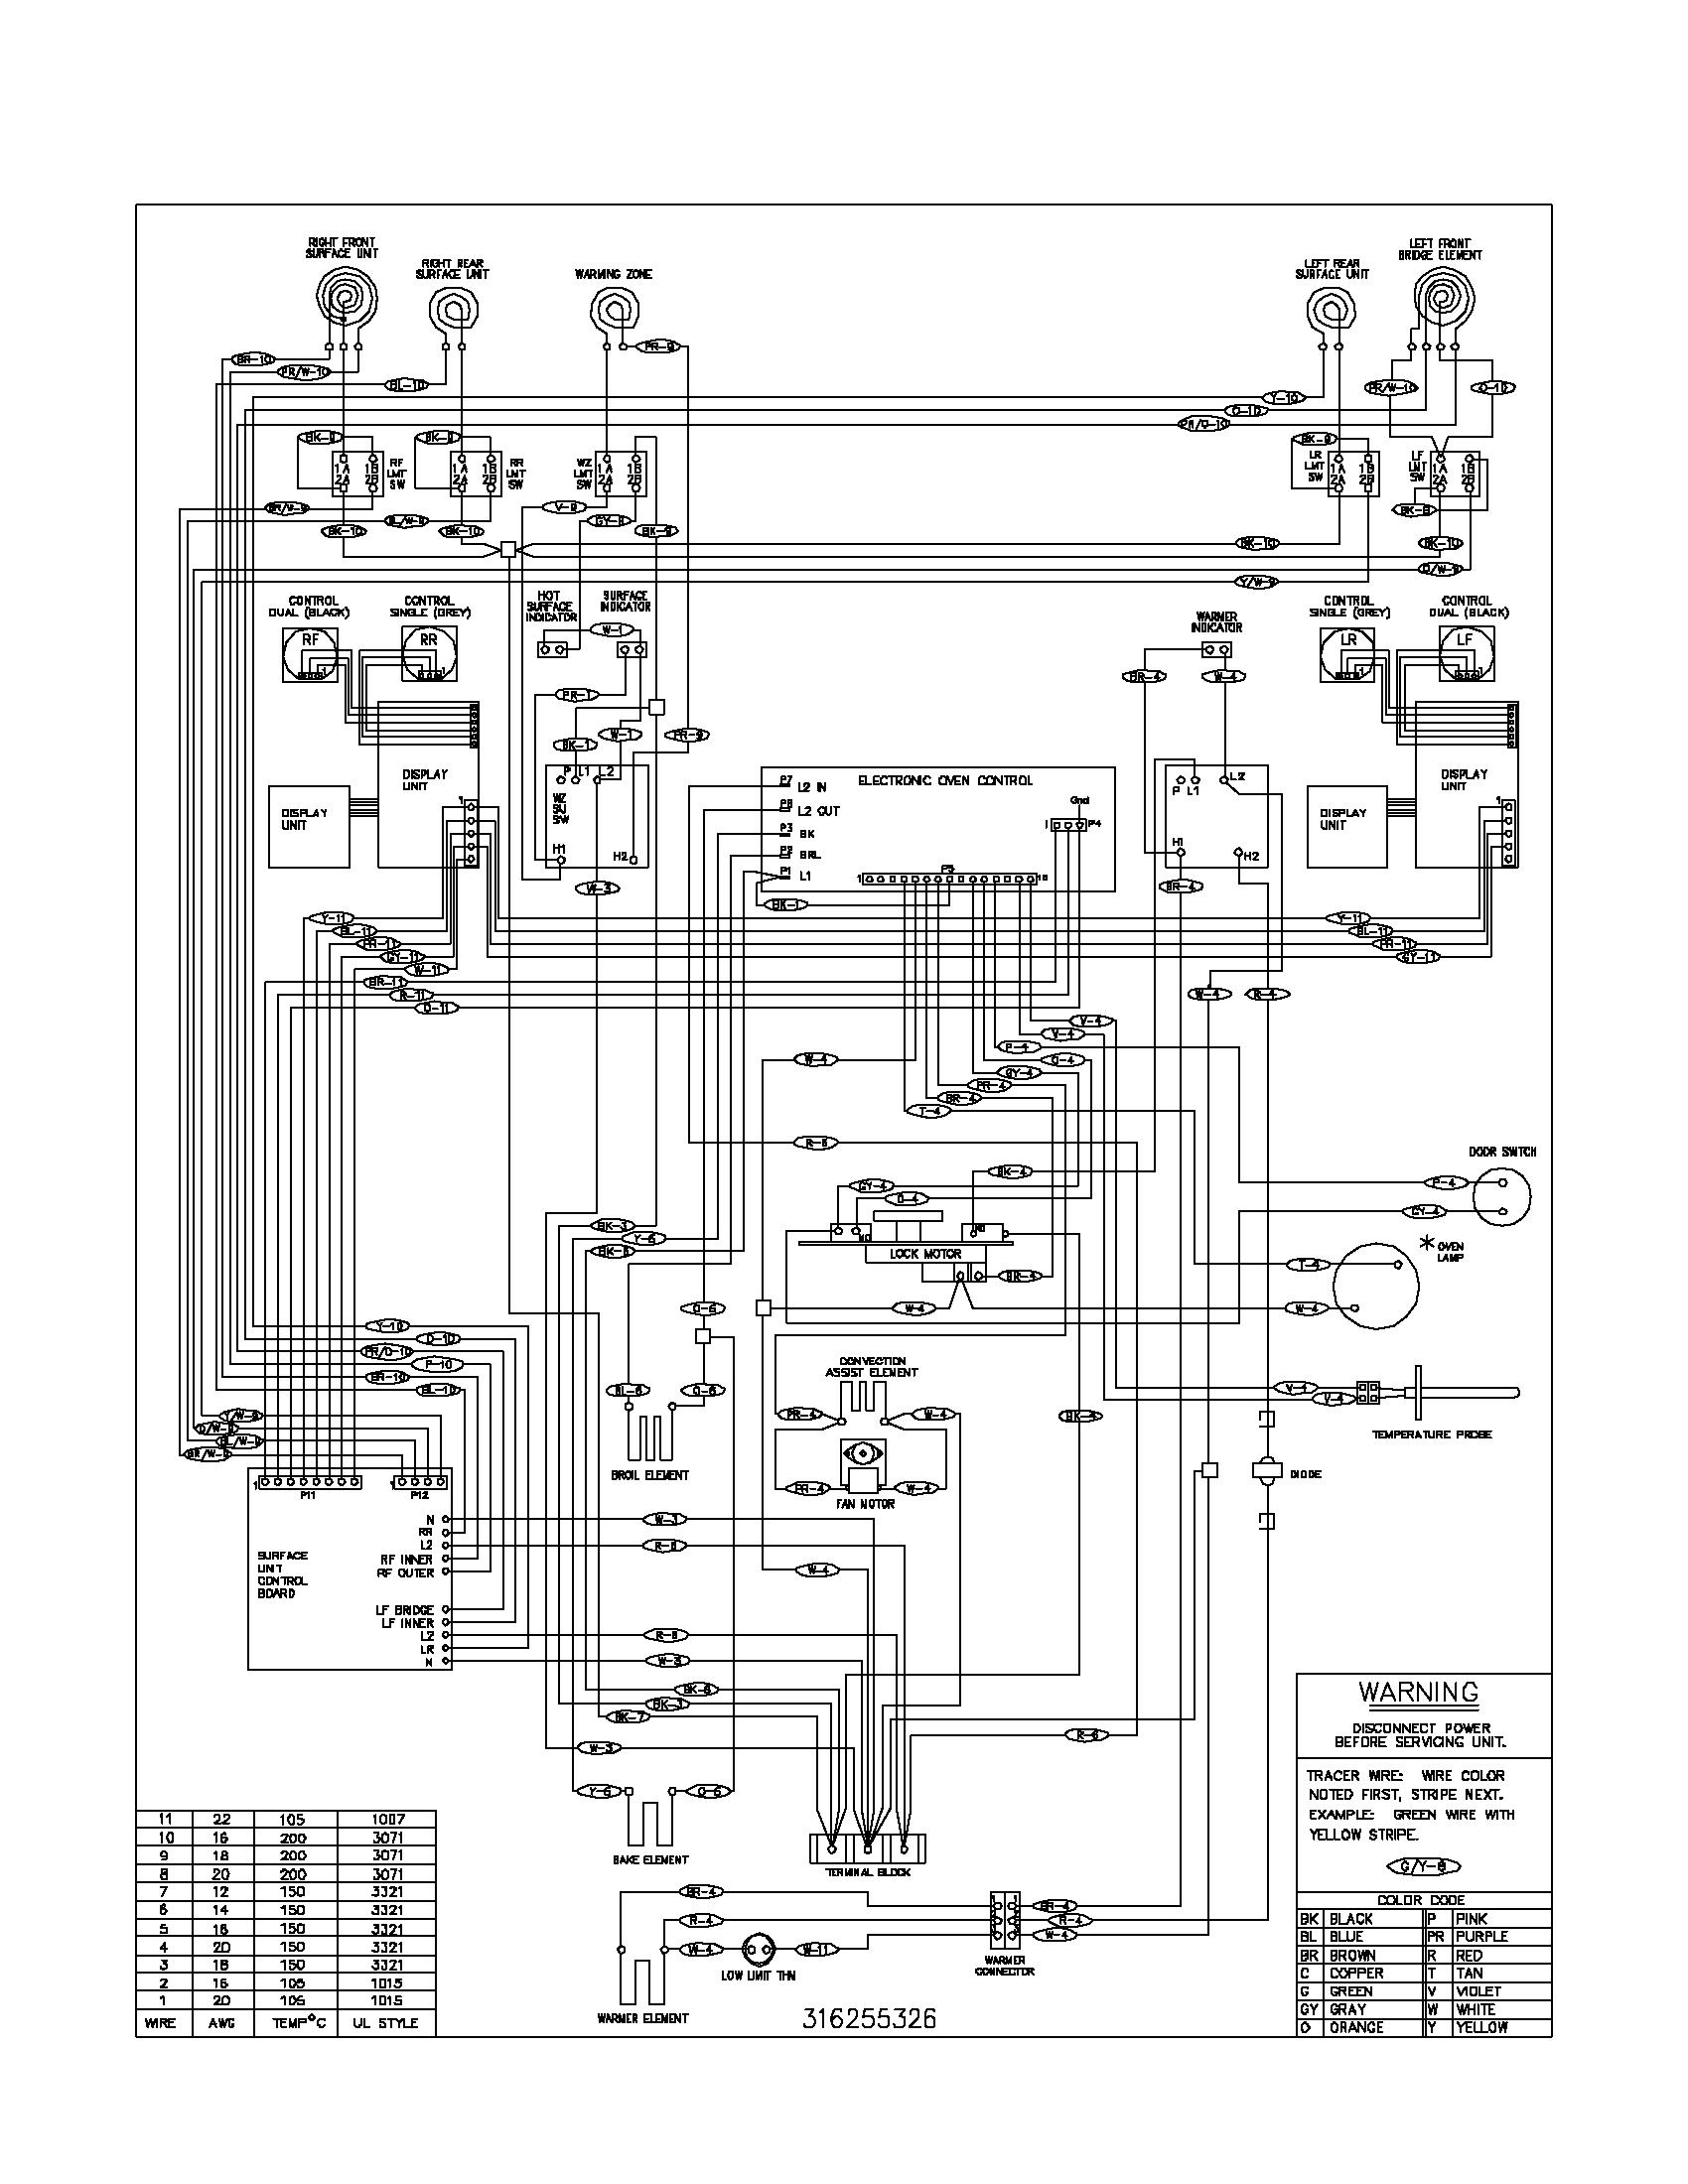 plef398ccc electric range wiring schematic parts diagram